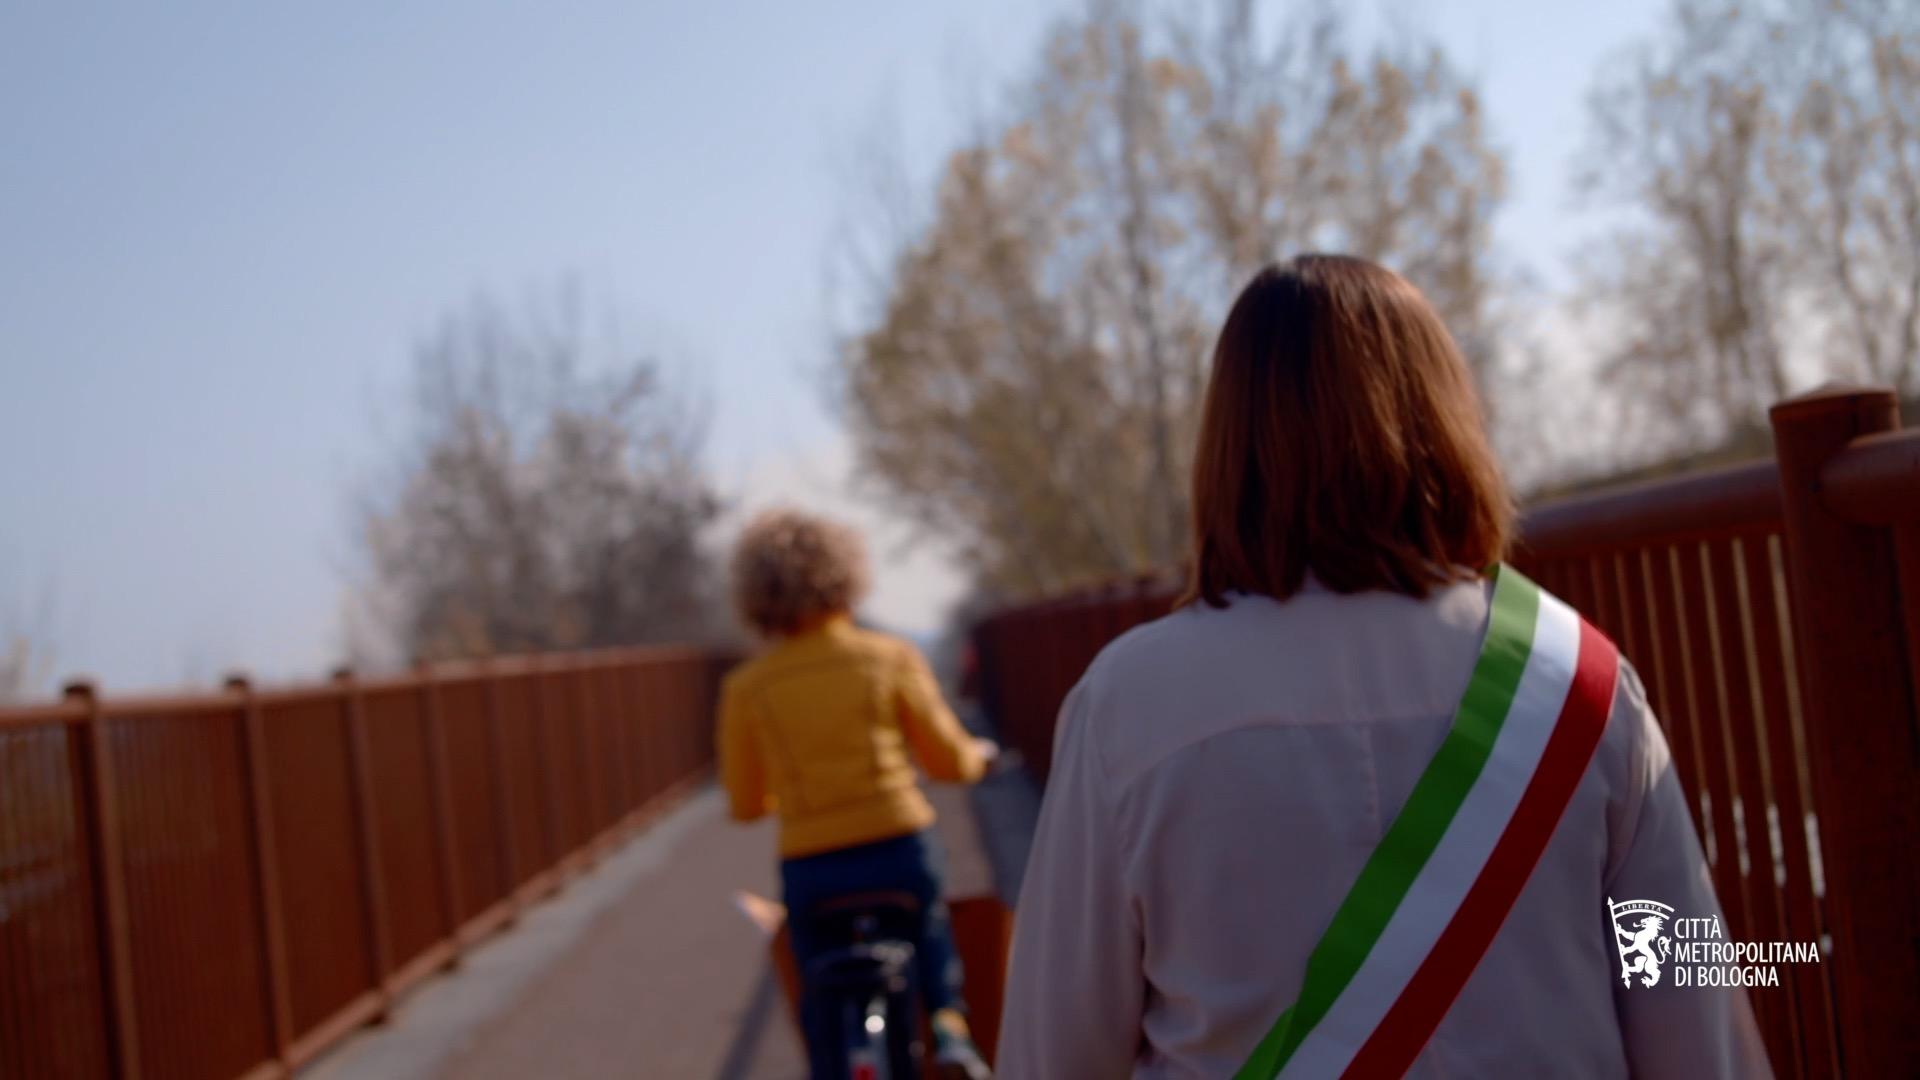 Ciclovia del Sole - Video promo con i sindaci lungo la Ciclovia